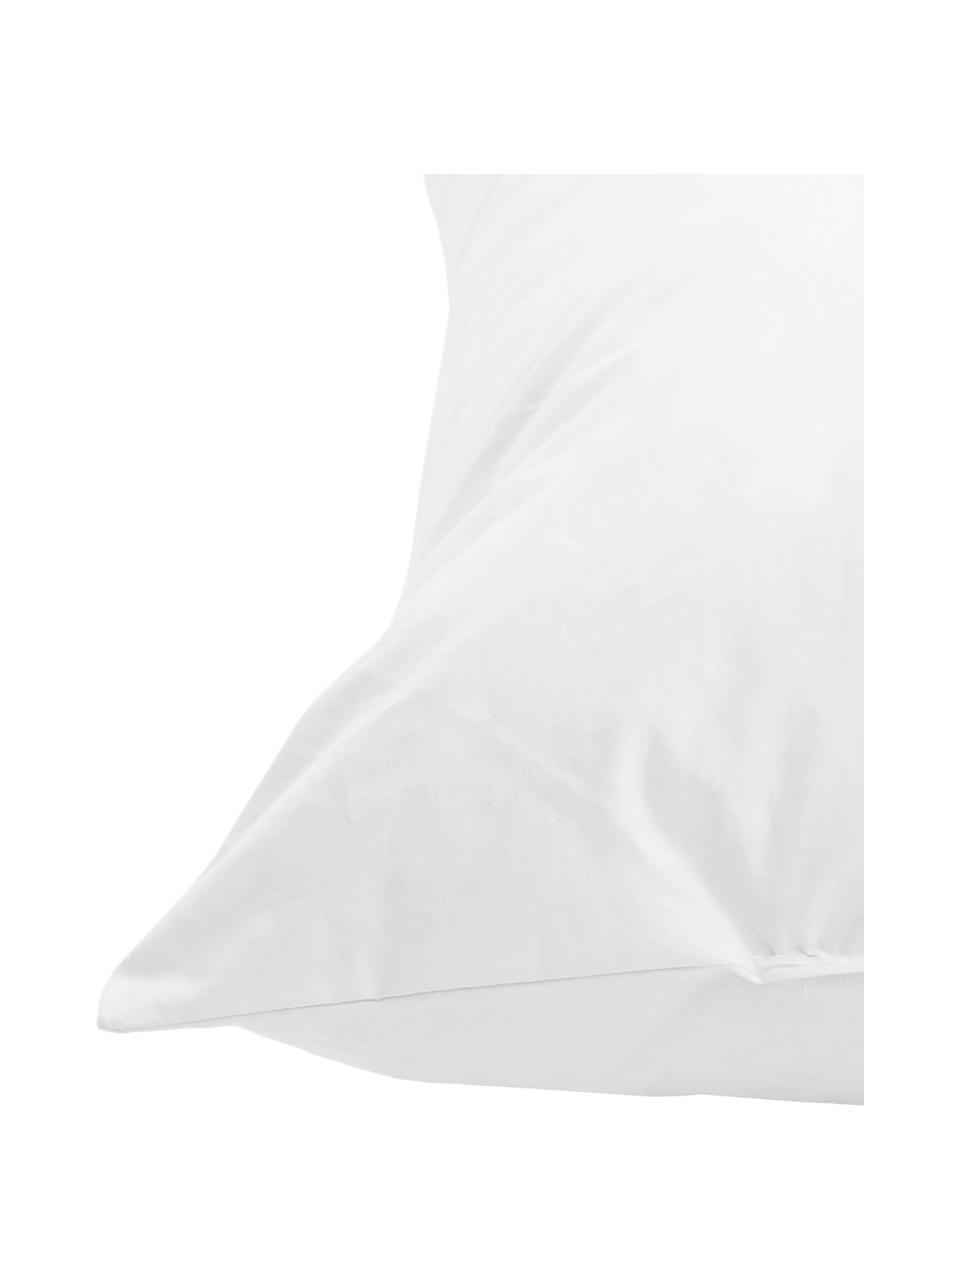 Kissen-Inlett Comfort, 50x50, Feder-Füllung, Bezug: Feinköper, 100% Baumwolle, Weiß, 50 x 50 cm